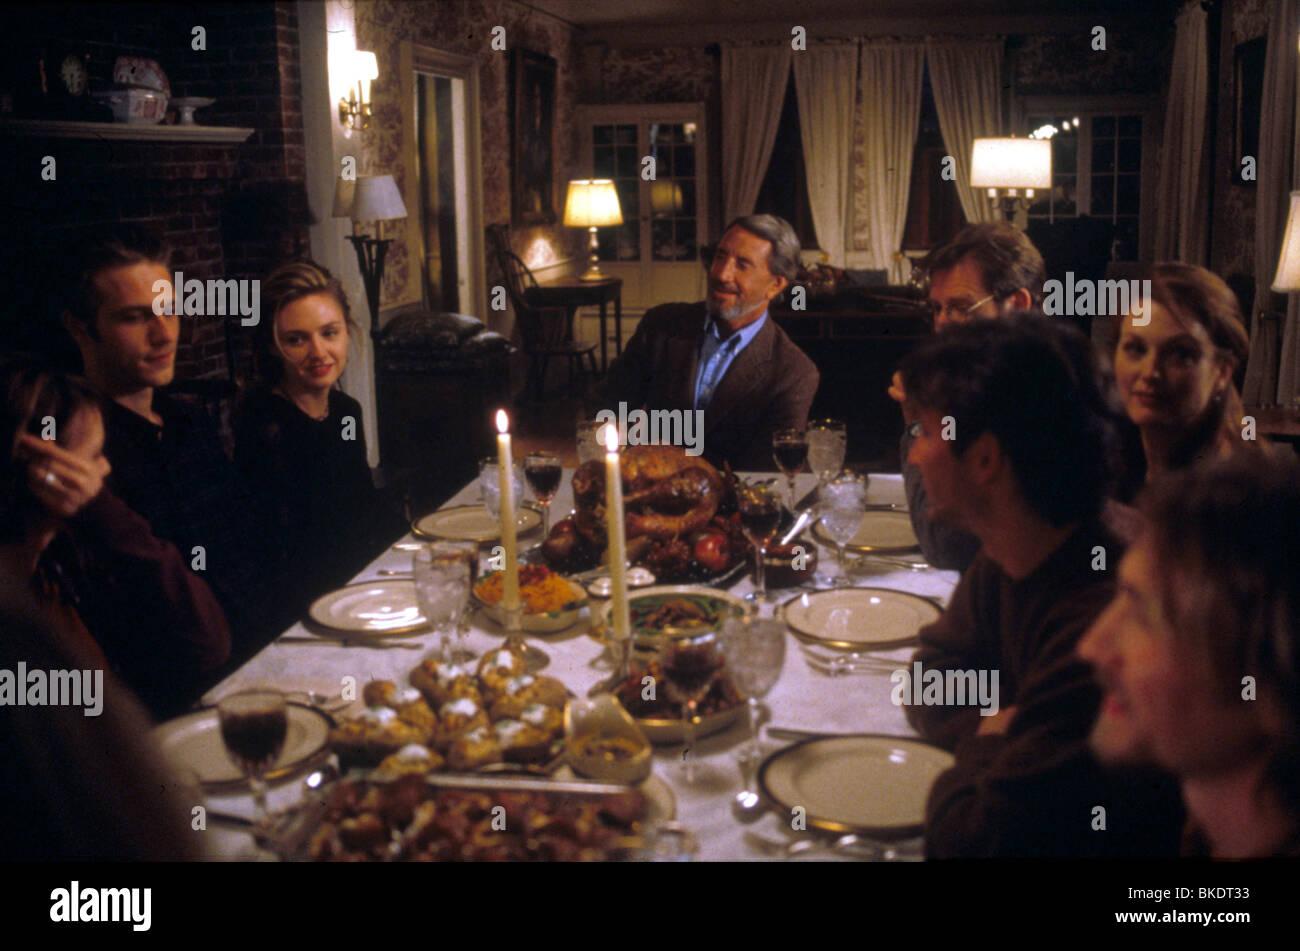 MYTH OF FINGERPRINTS (1997) BACK HOME (ALT) JAMES LE GROS,HOPE DAVIS,ARIJA BAREIKIS,ROY SCHEIDER.BRIAN KERWIN,JULIANNE - Stock Image